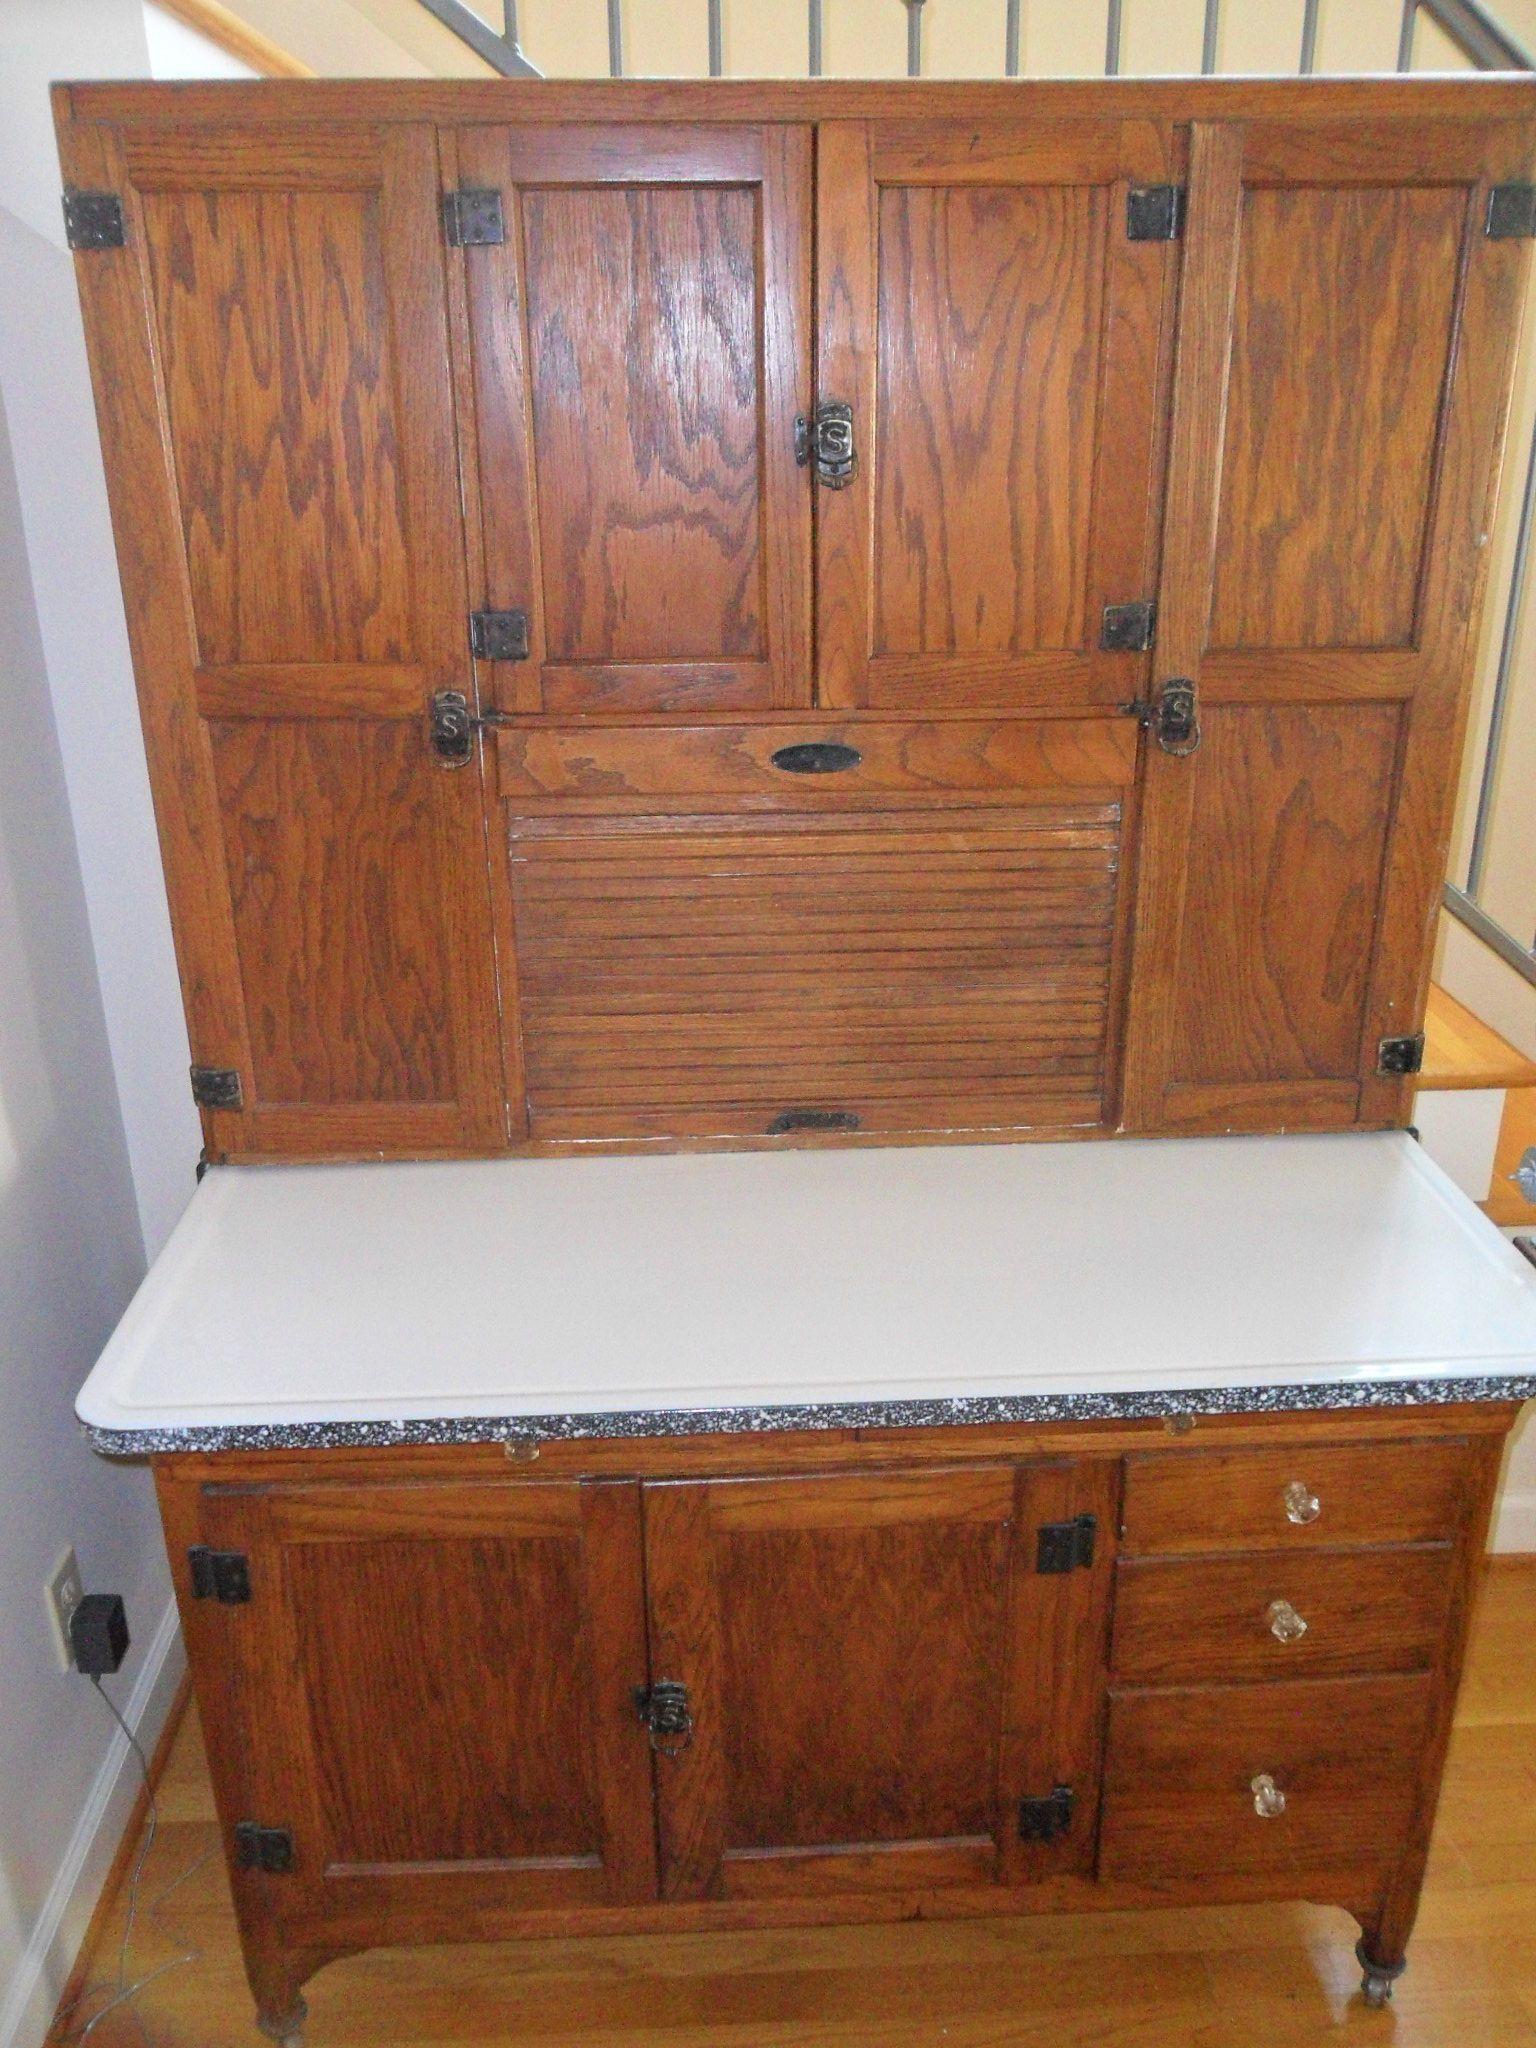 Sellers Kitchen Cabinet Details About 1920s 1930s Oak Sellers Kitchen Cabinet Cabinets